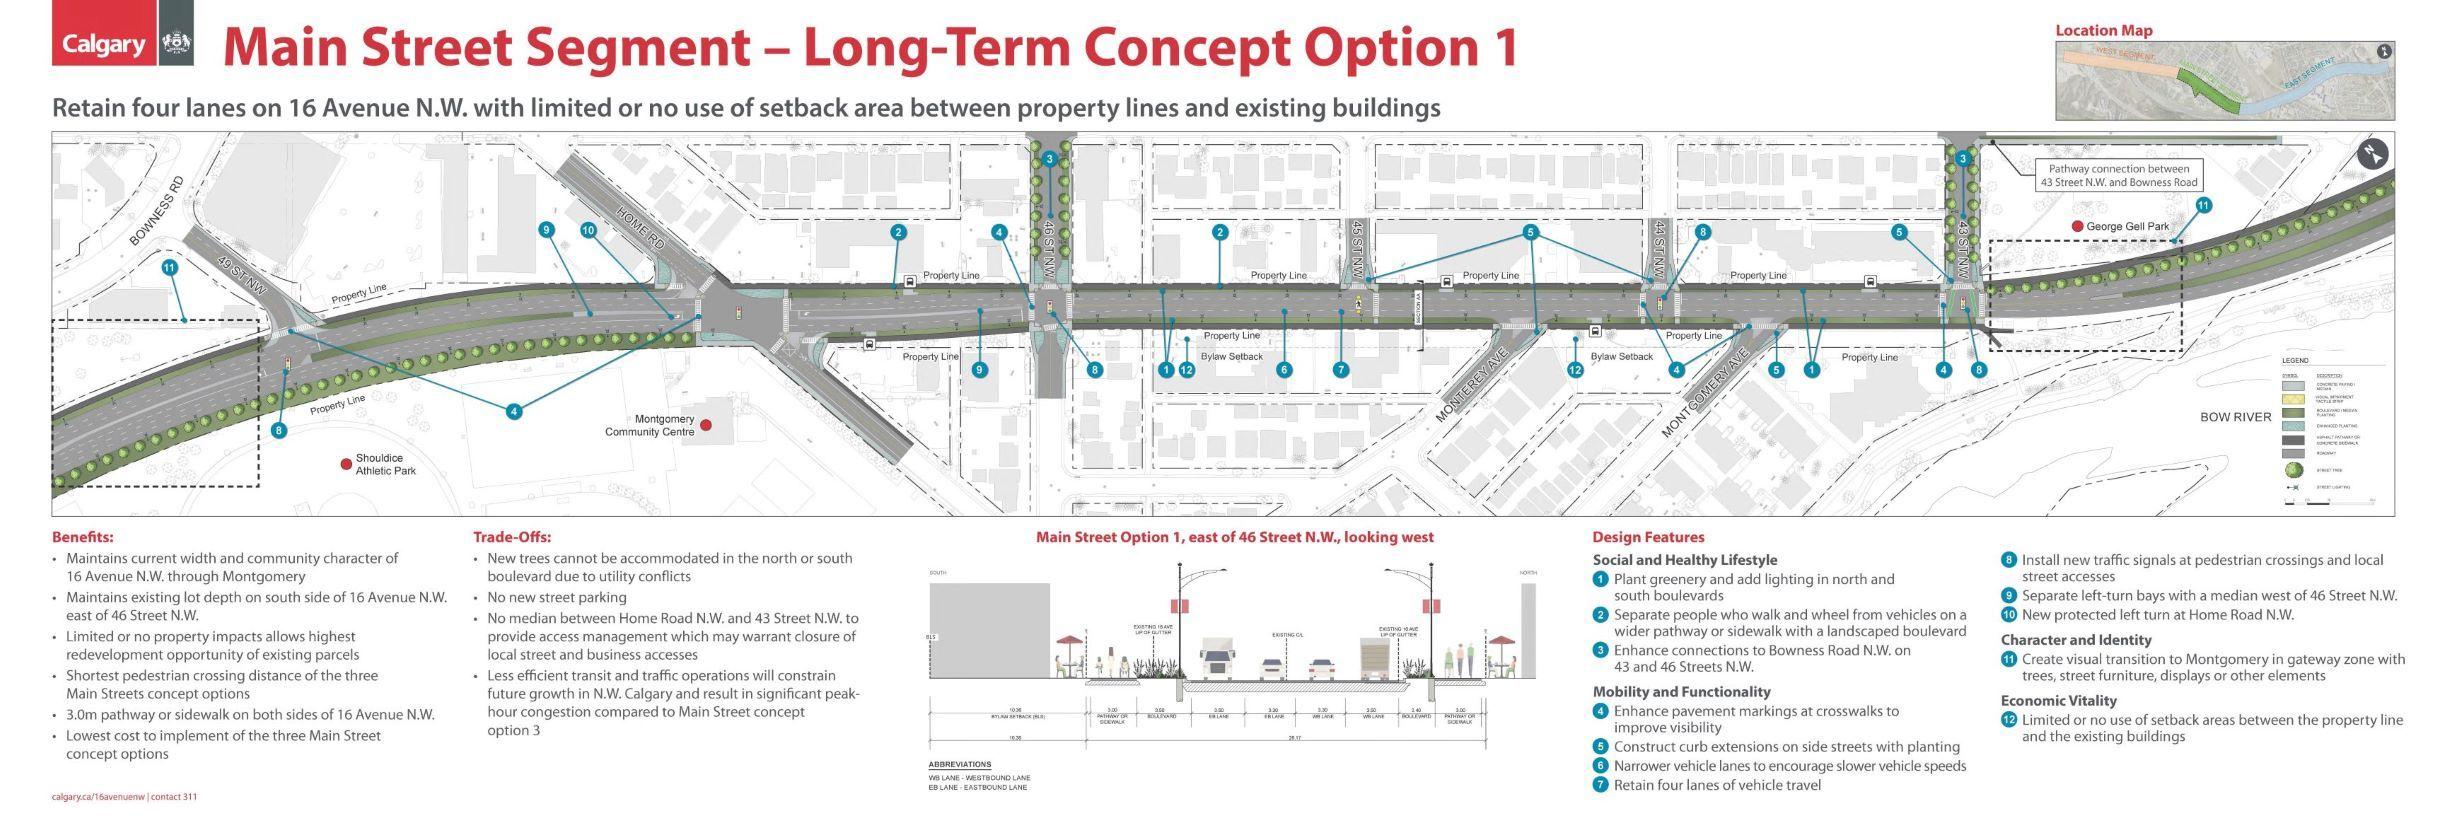 Main Street Segment Option 1